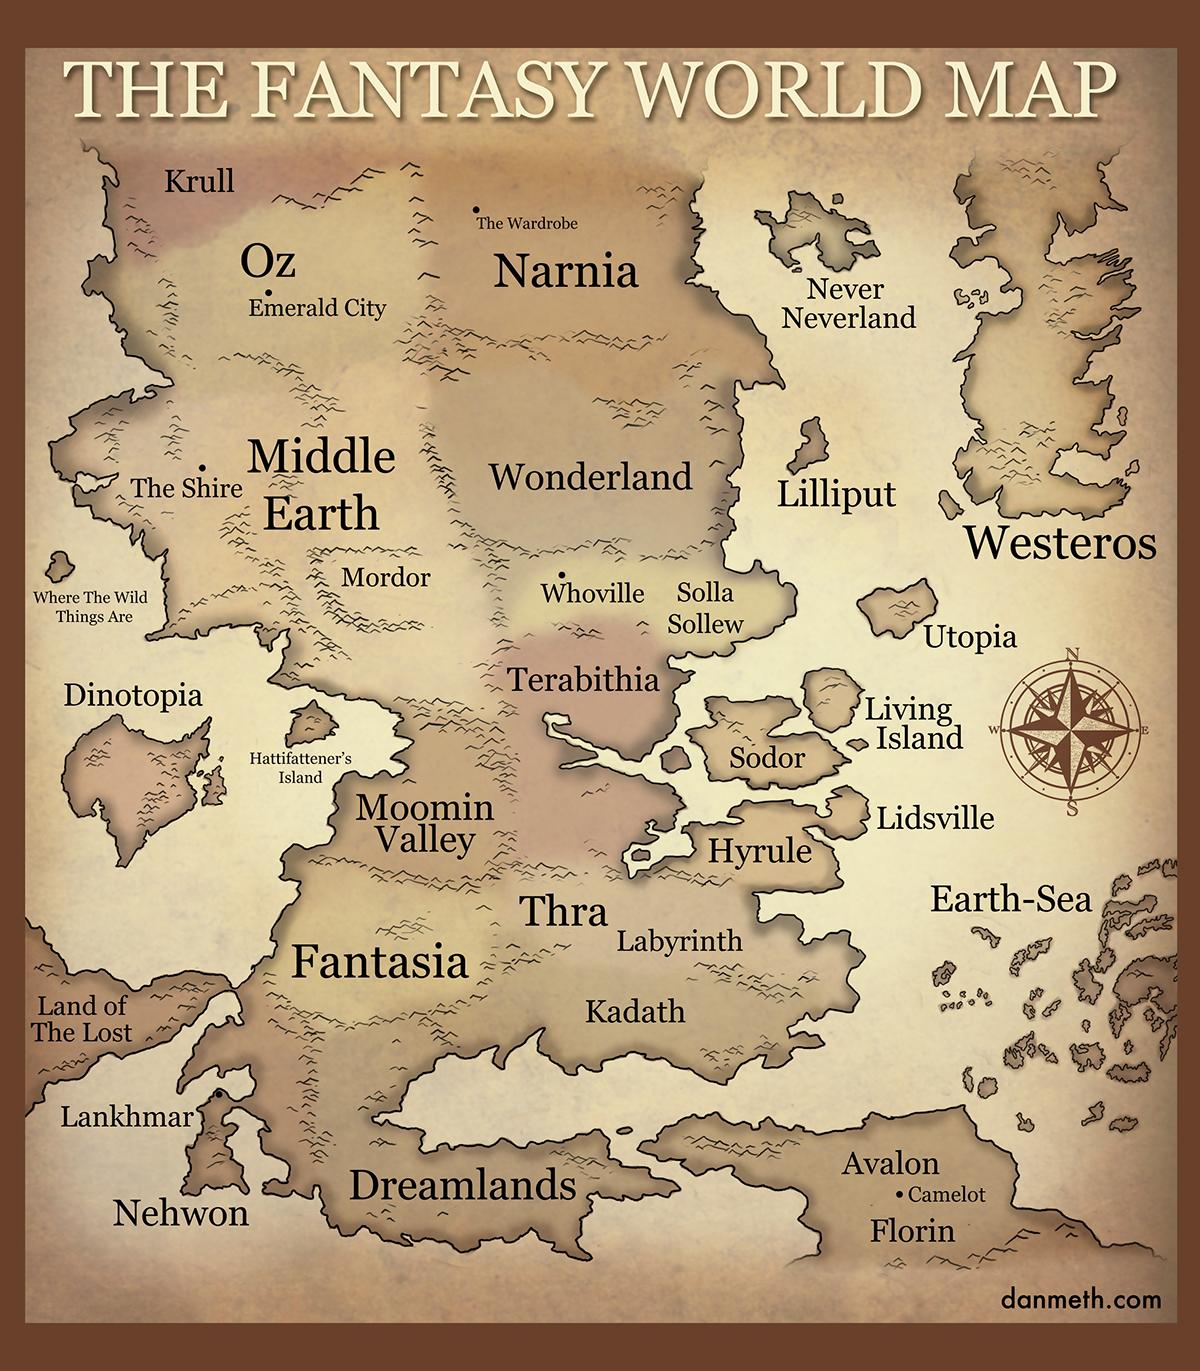 File:Dan Meth   The Fantasy World Map.png   TheAlmightyGuru